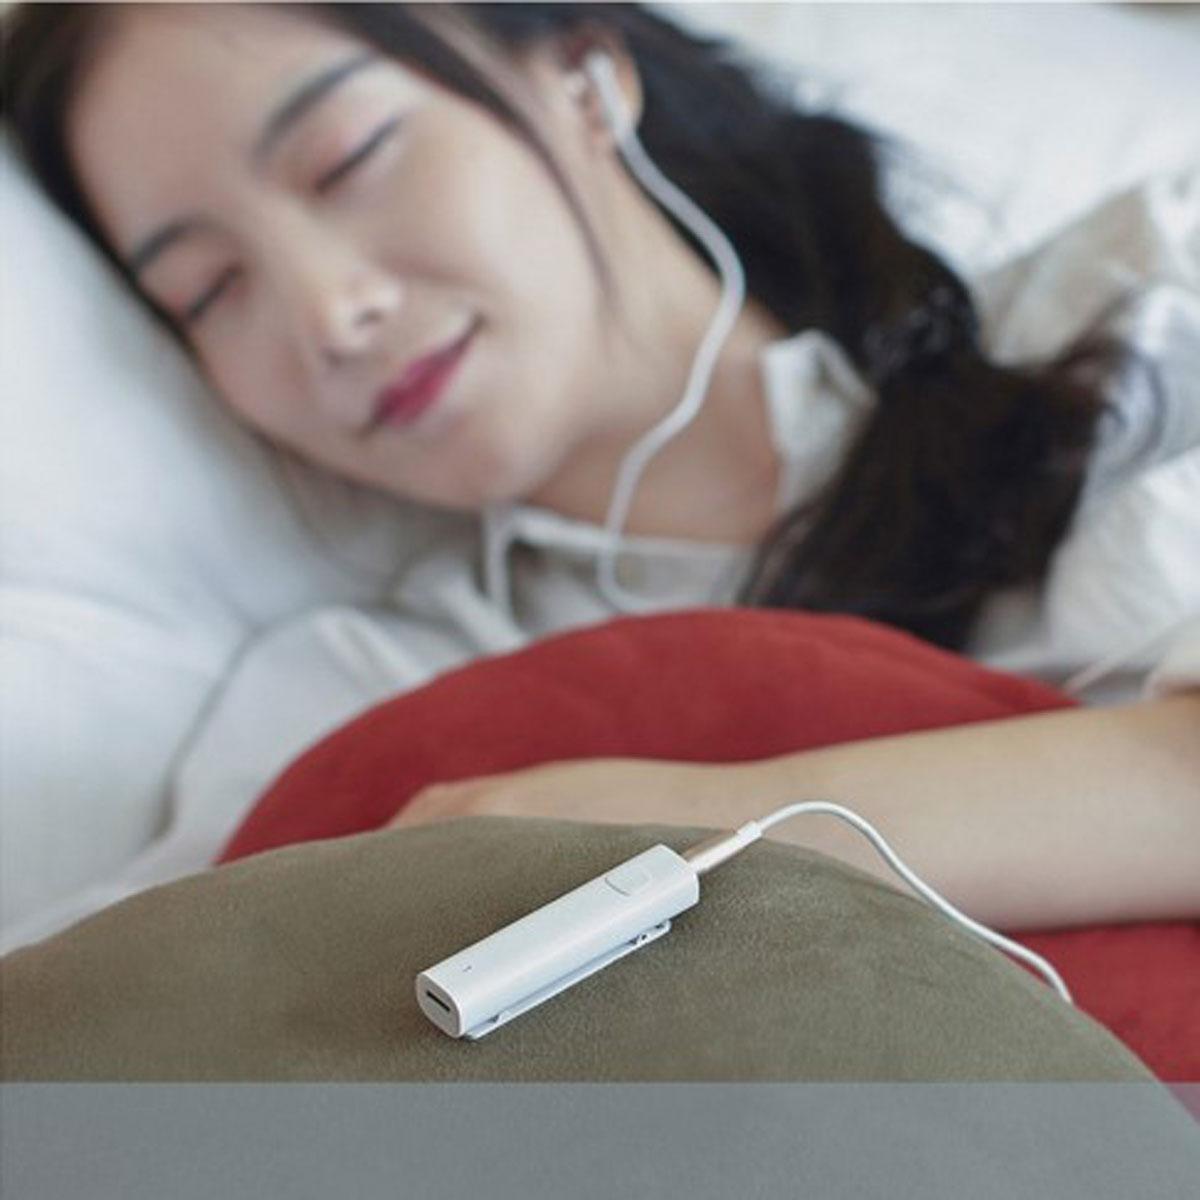 Xiaomi Mi Bluetooth Receiver Ses Alıcı 4.2 Kulaklık Adaptörü